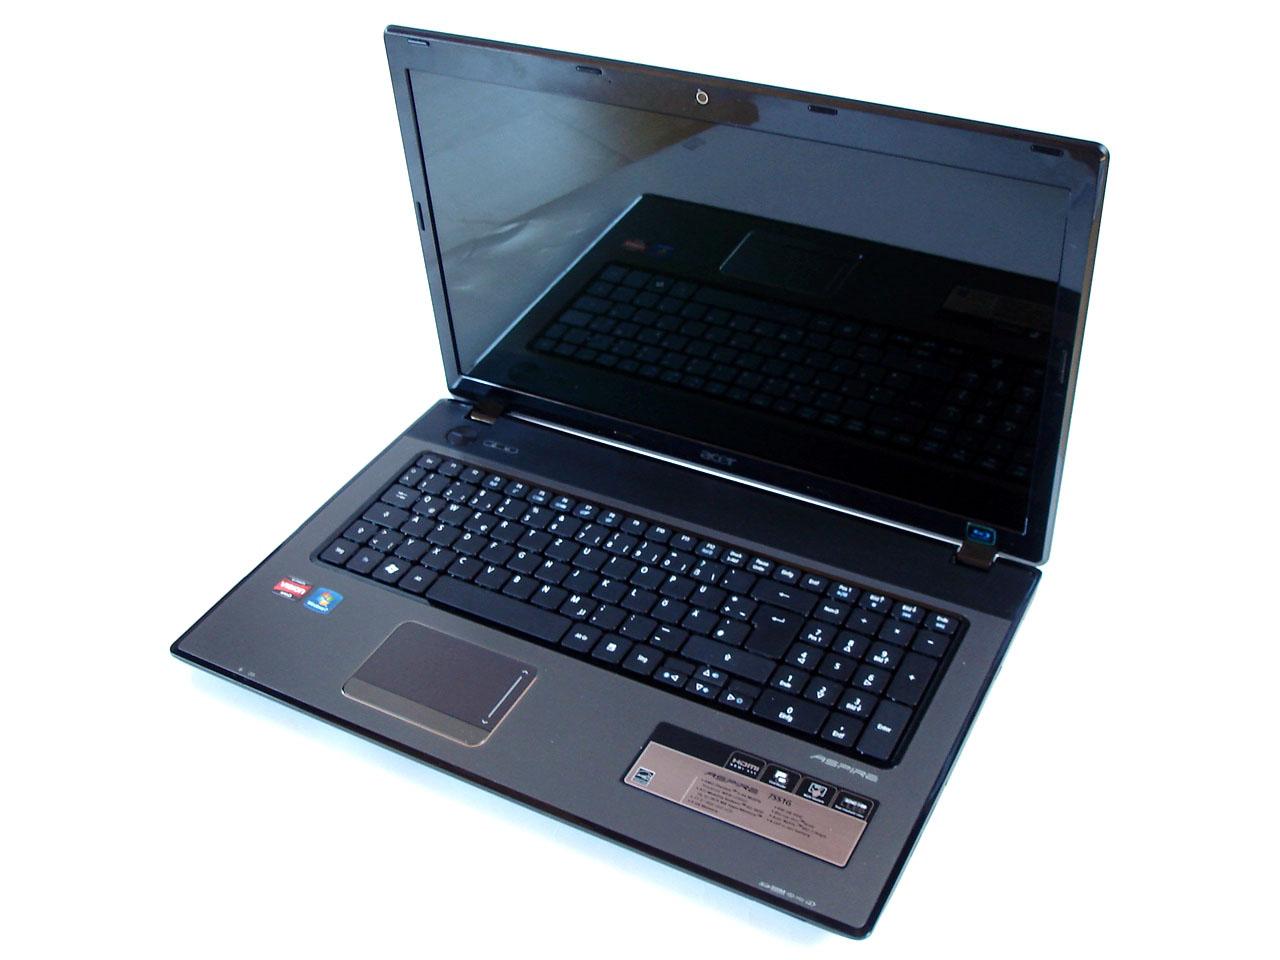 Ноутбук Acer TravelMate TMP278-MG-31H4 (NX.VBQER.004) Core i3-6006U (2.0)/4GB/1TB/17.3